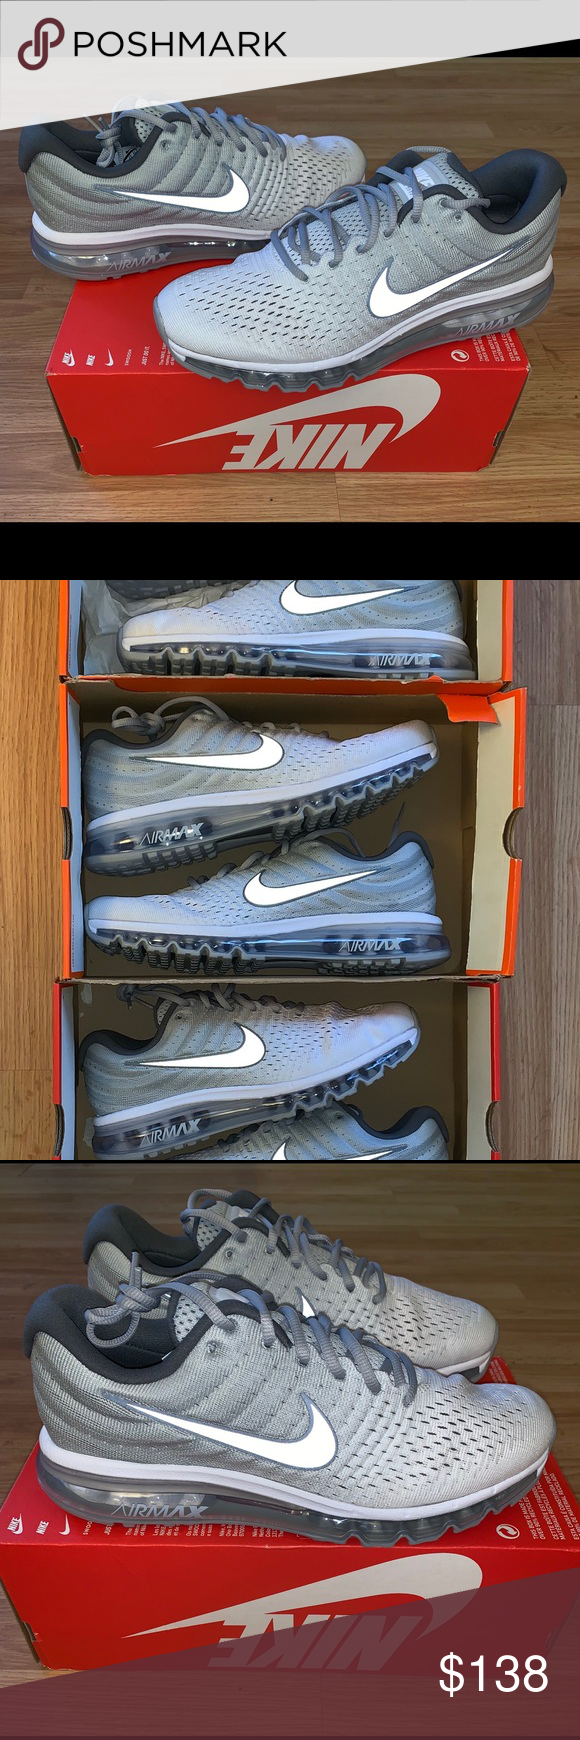 New Nike Airmax 2017 Wolf Grey Mens Size 10 11.5 New ! Nike